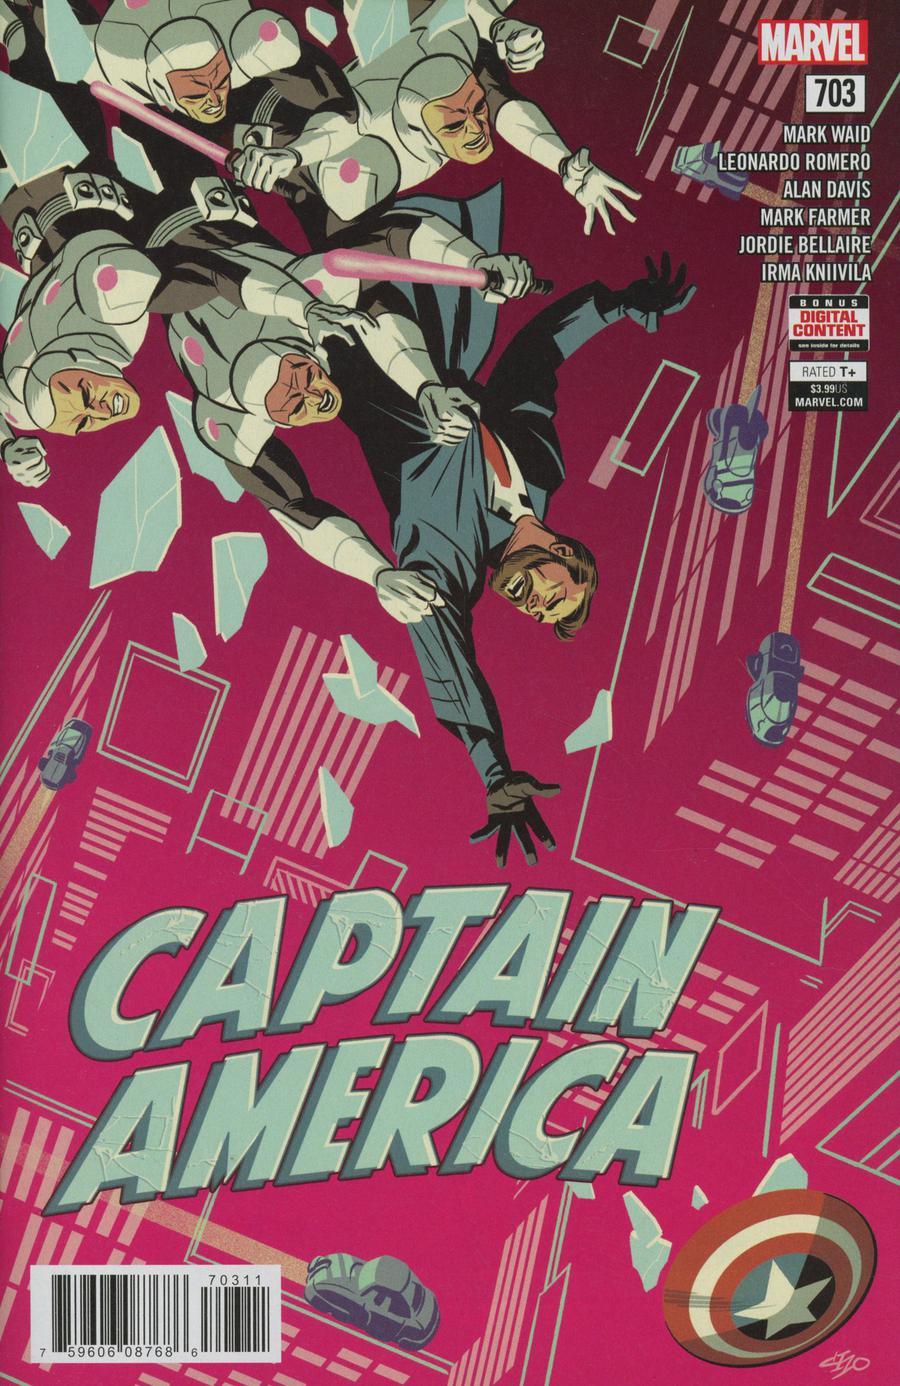 Captain America Vol 8 #703 Cover A Regular Michael Cho Cover